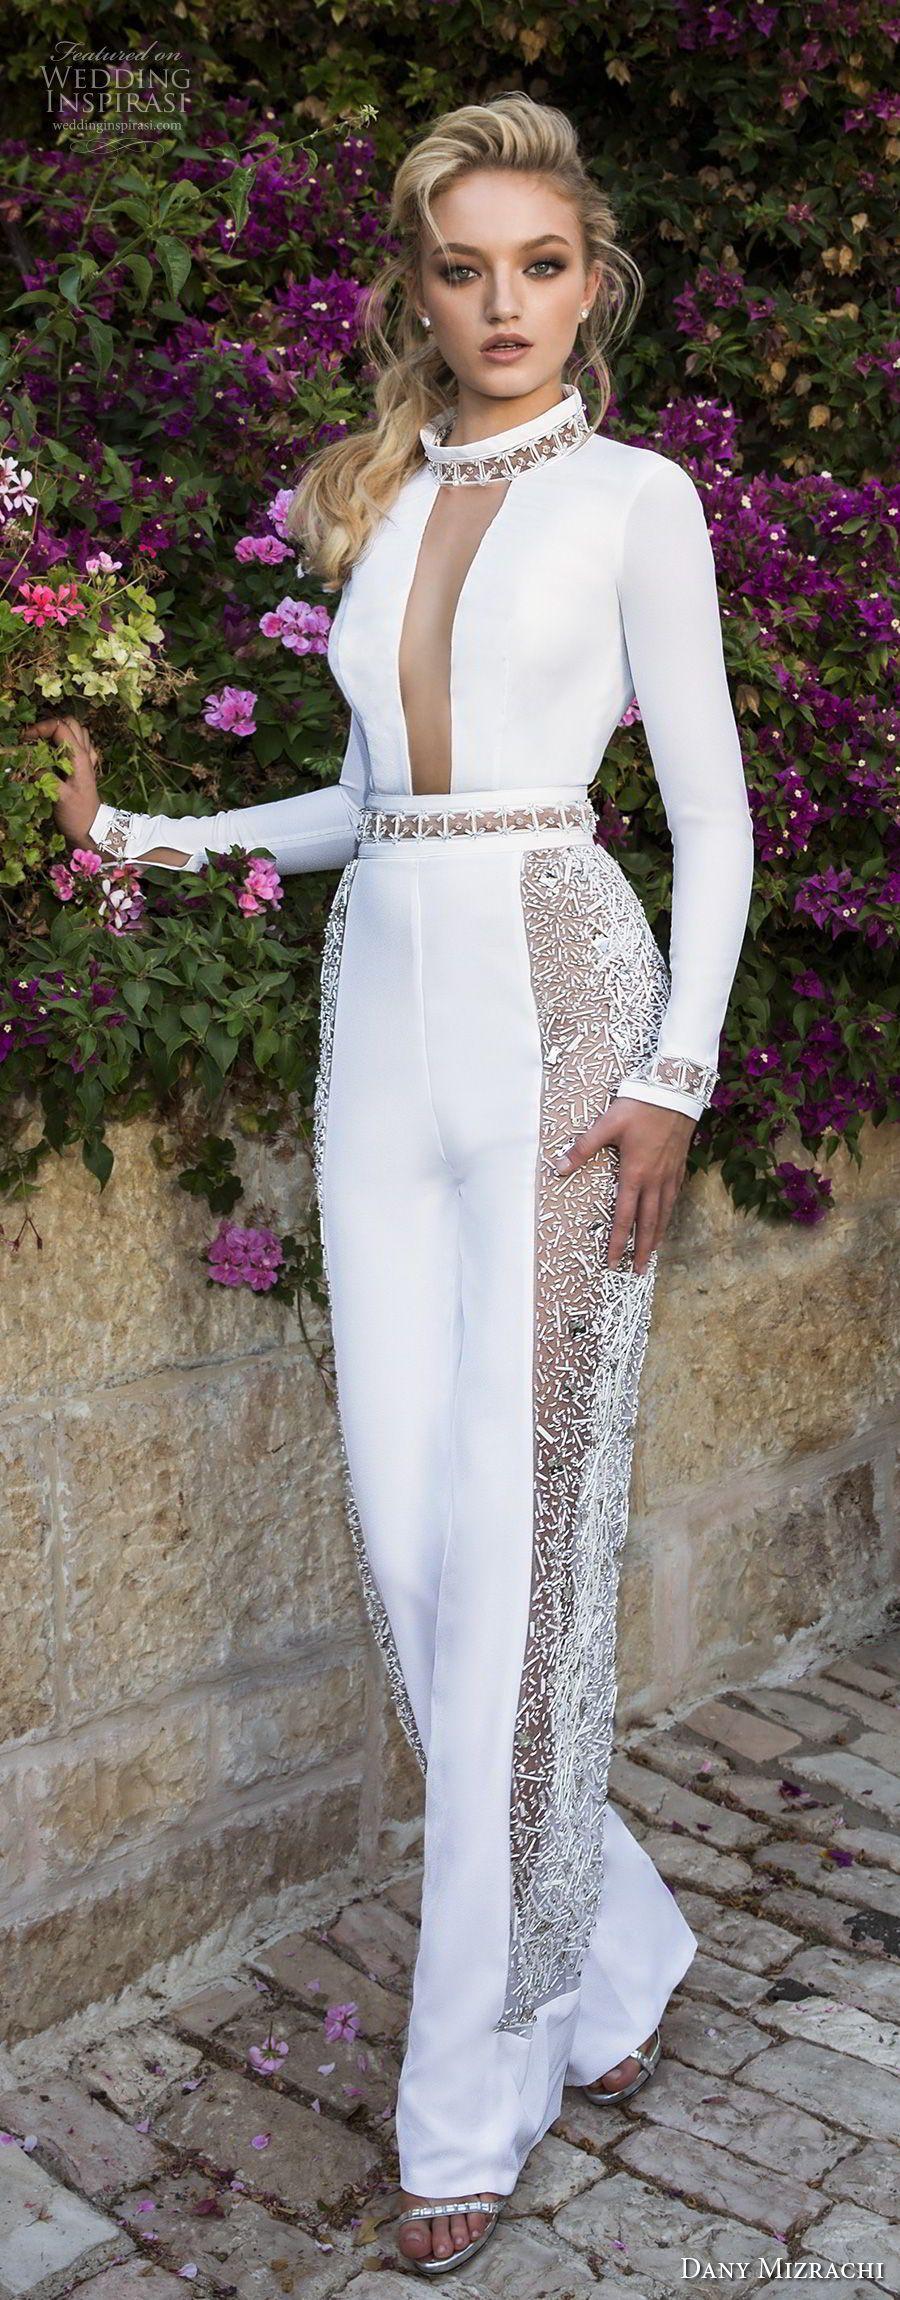 Dany mizrachi spring bridal long sleevess high neck keyhole